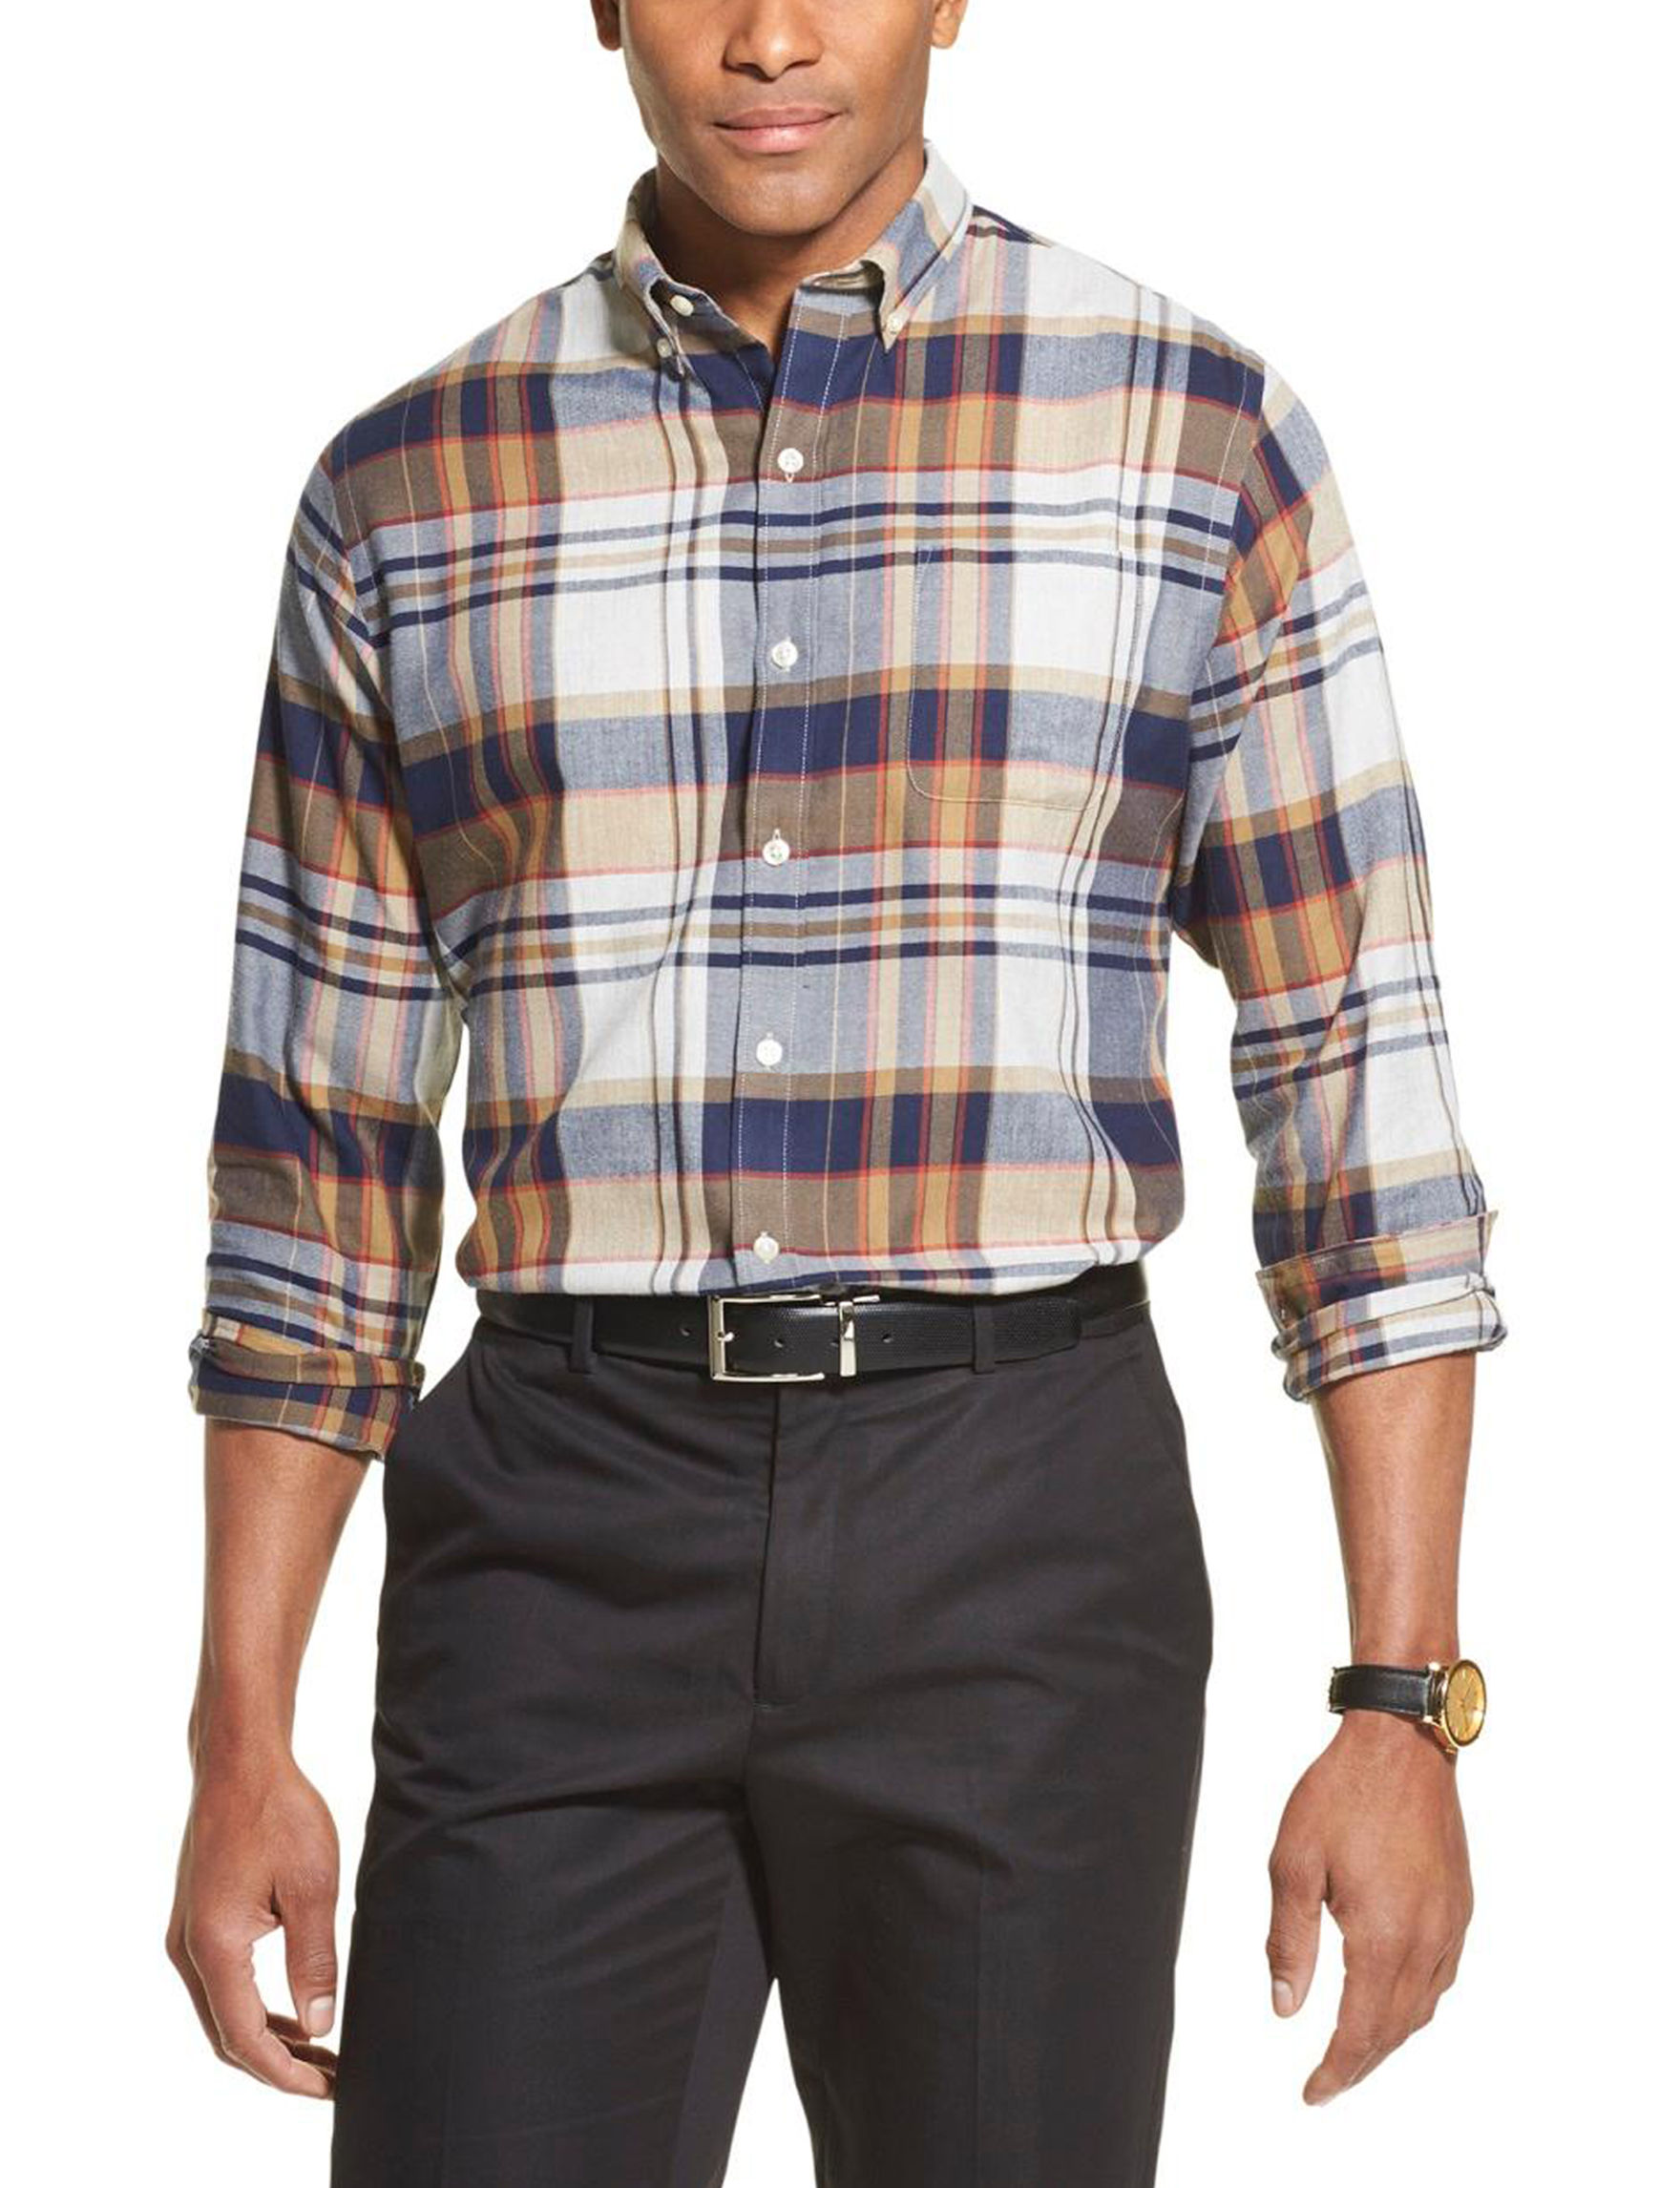 Van Heusen Beige Plaid Casual Button Down Shirts